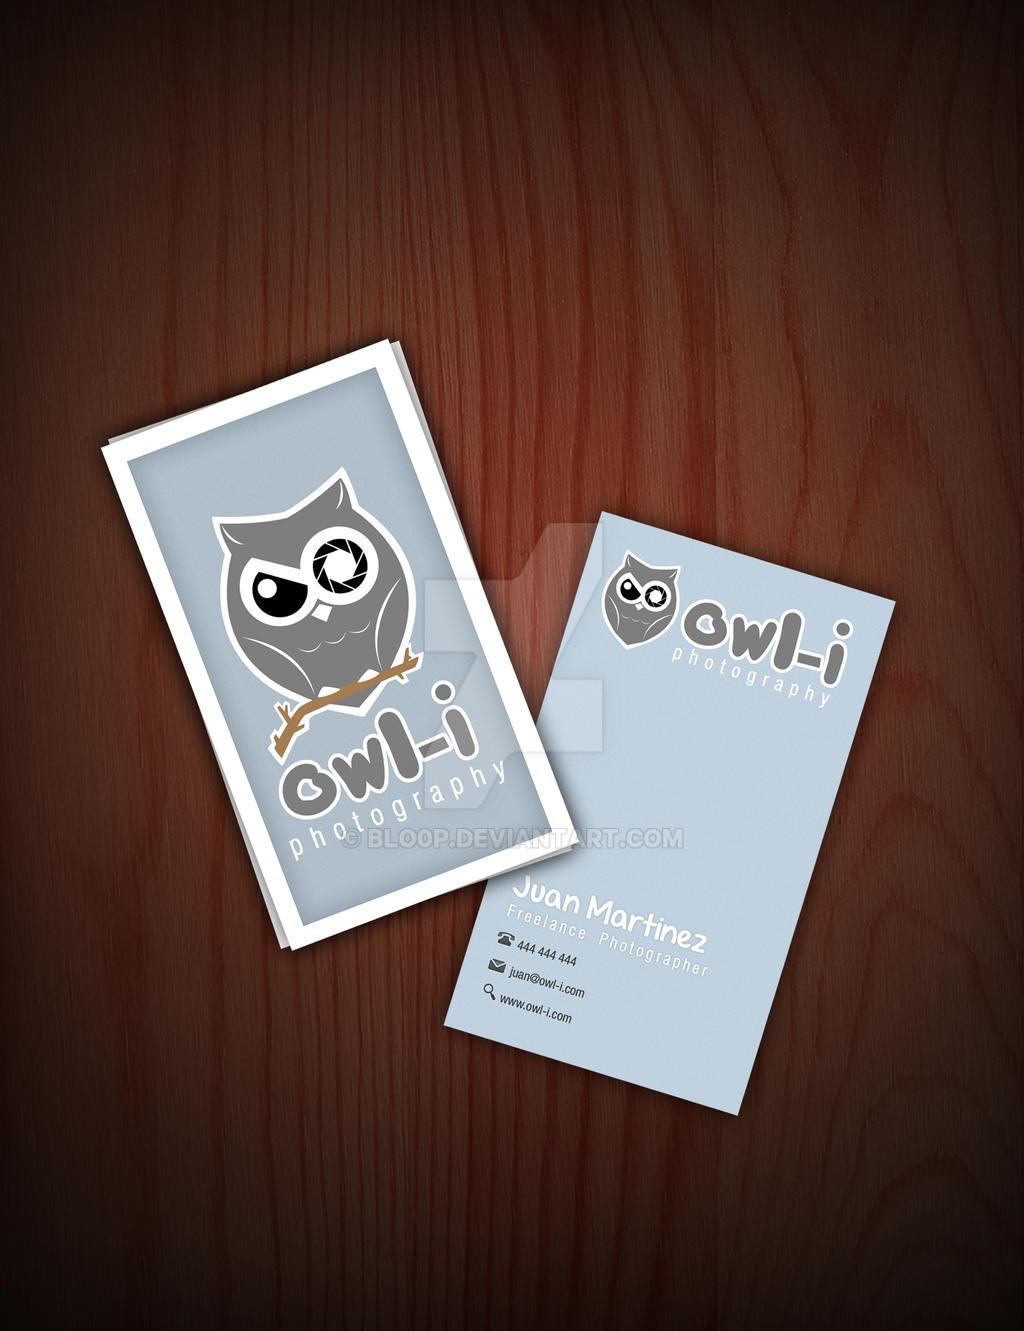 Origami owl business cards vistaprint